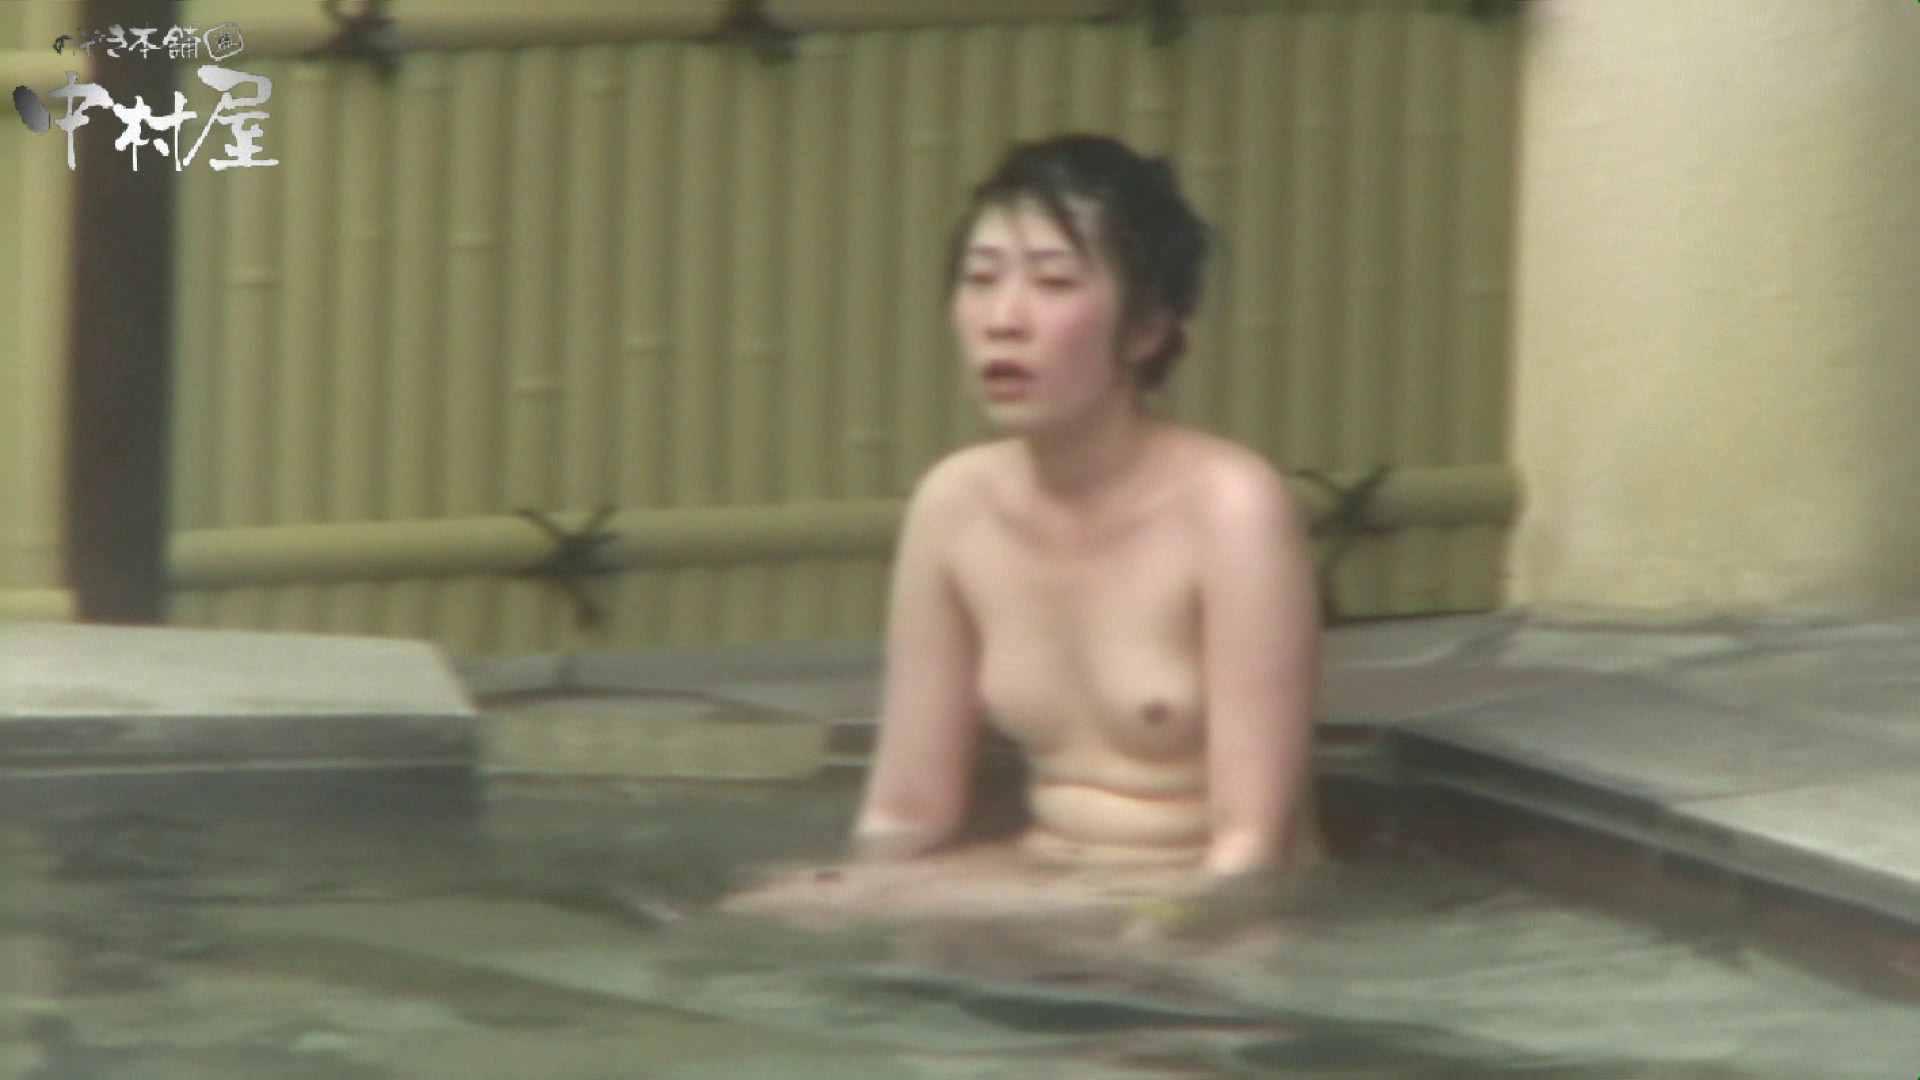 Aquaな露天風呂Vol.955 盗撮師作品 | 露天風呂突入  85pic 22